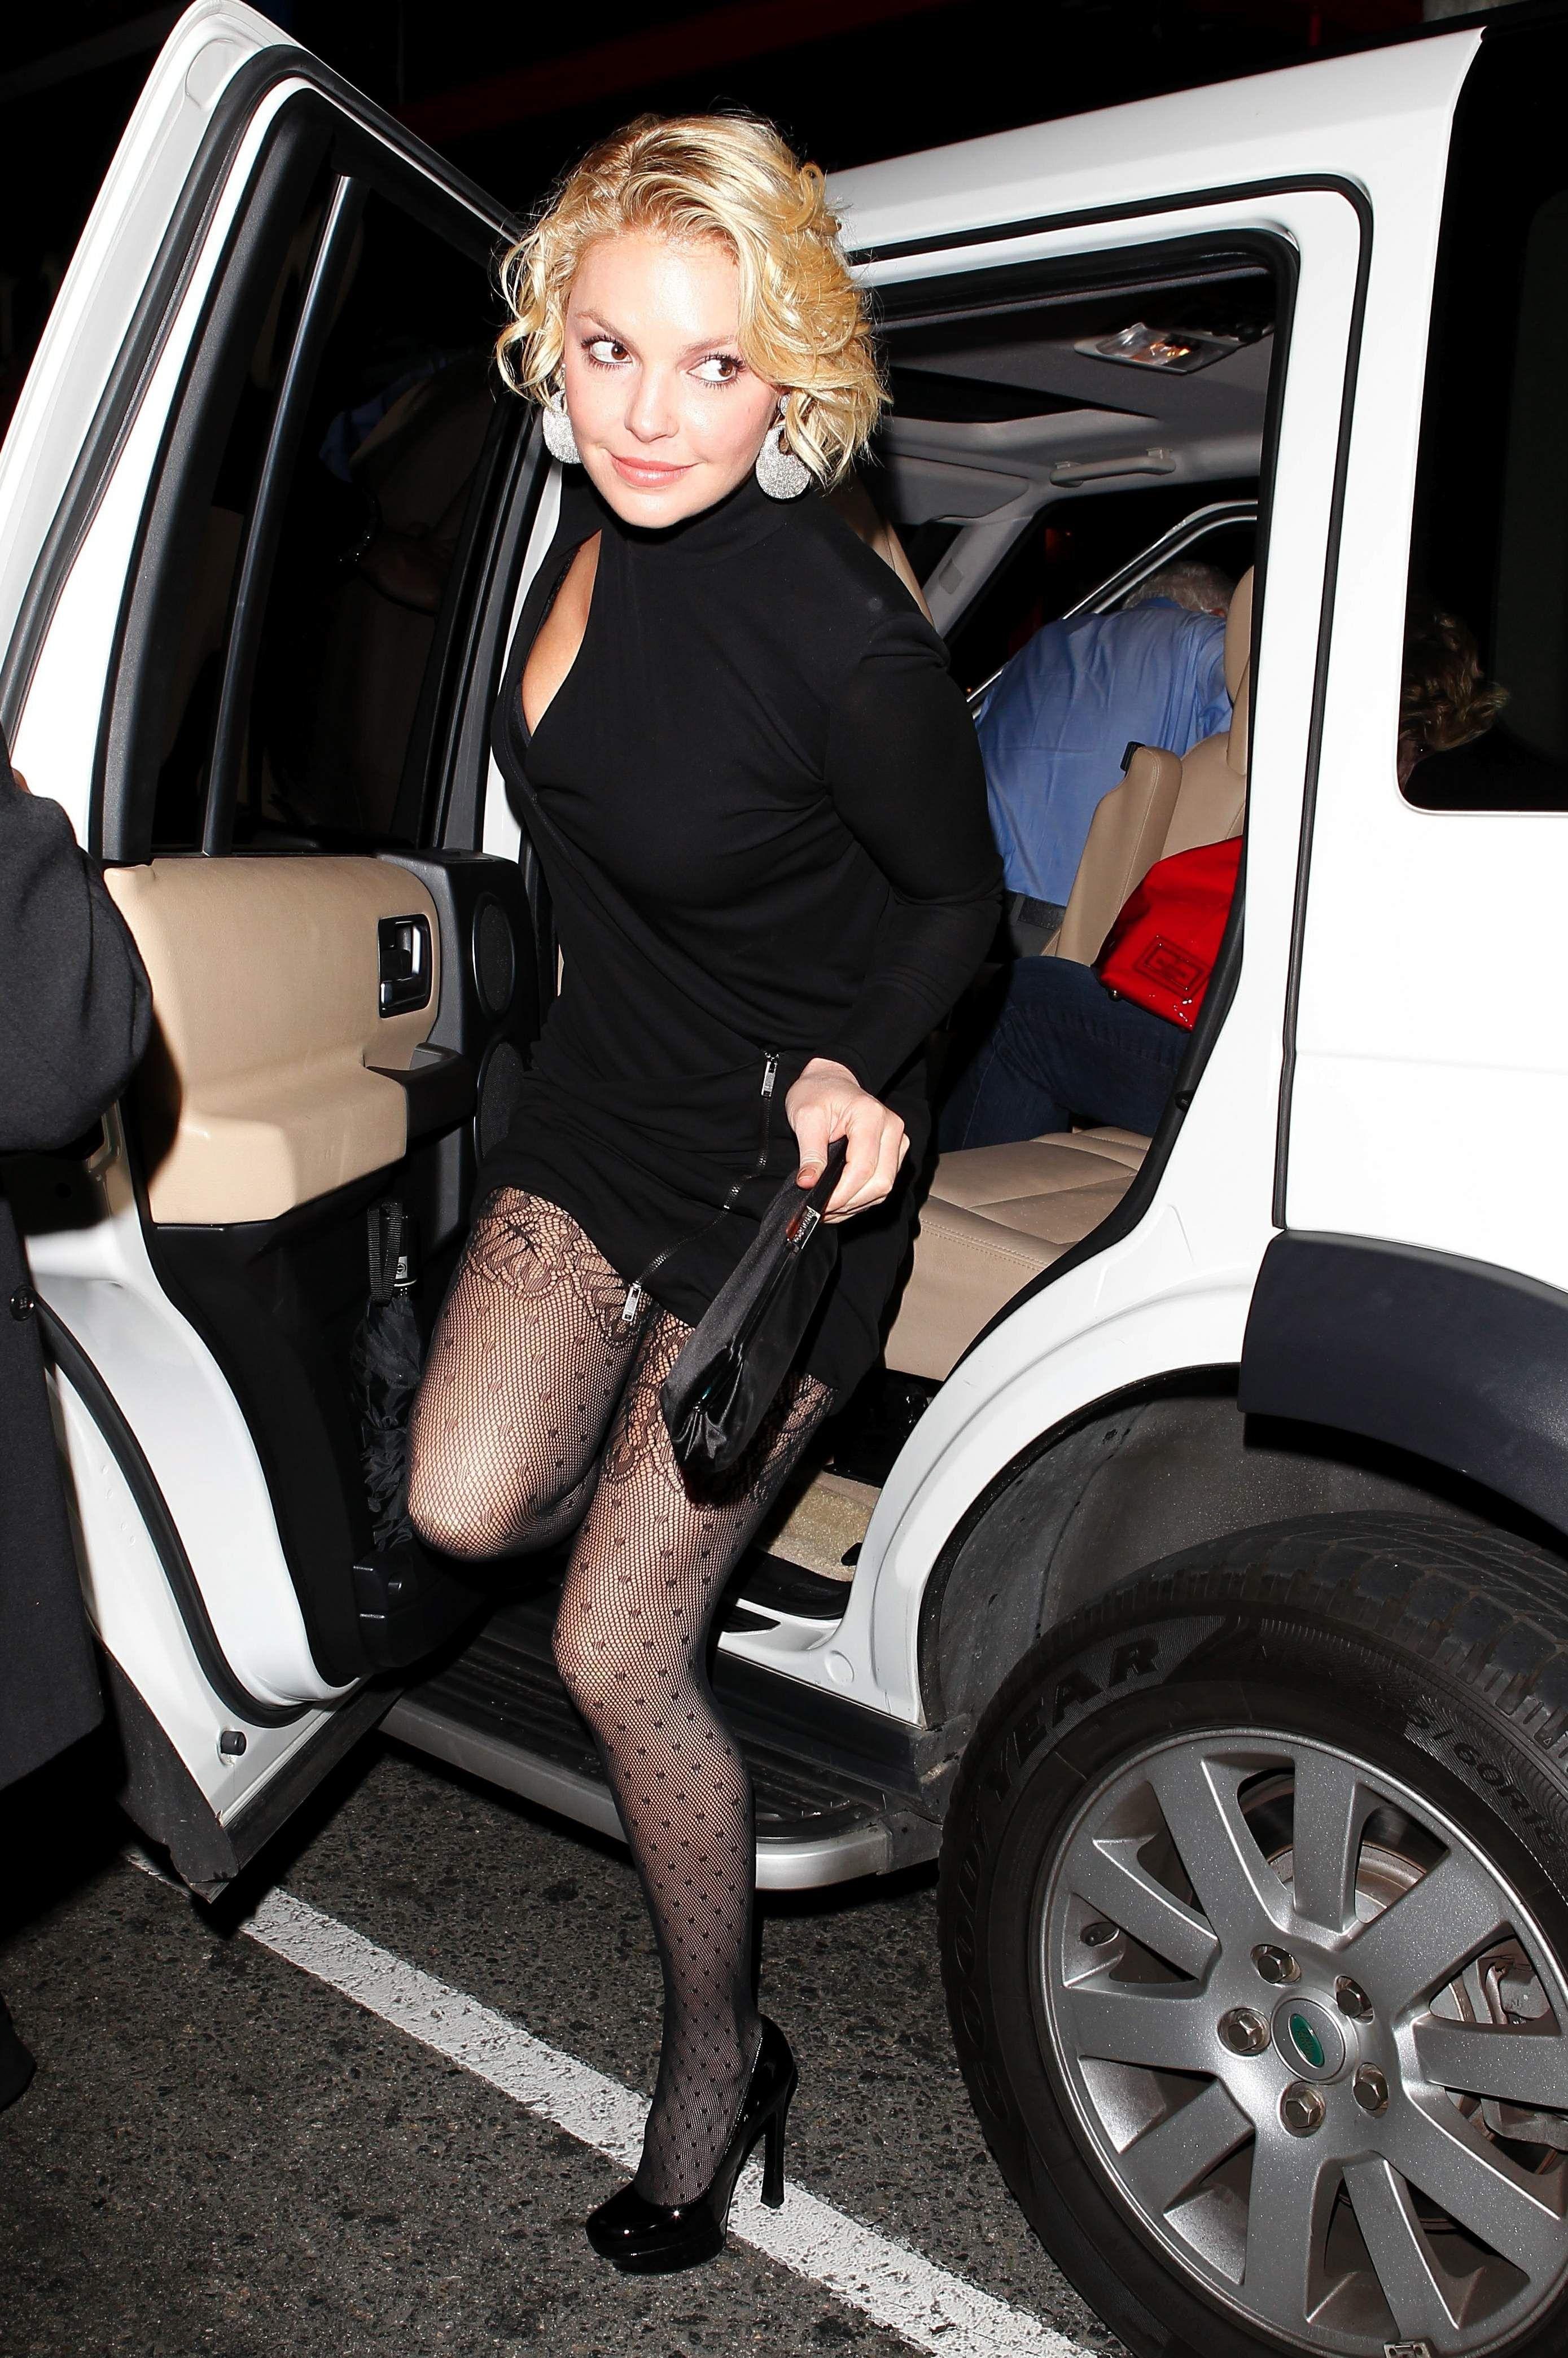 Katherine Heigl | Celebrities in Tights A-L | Pinterest ...